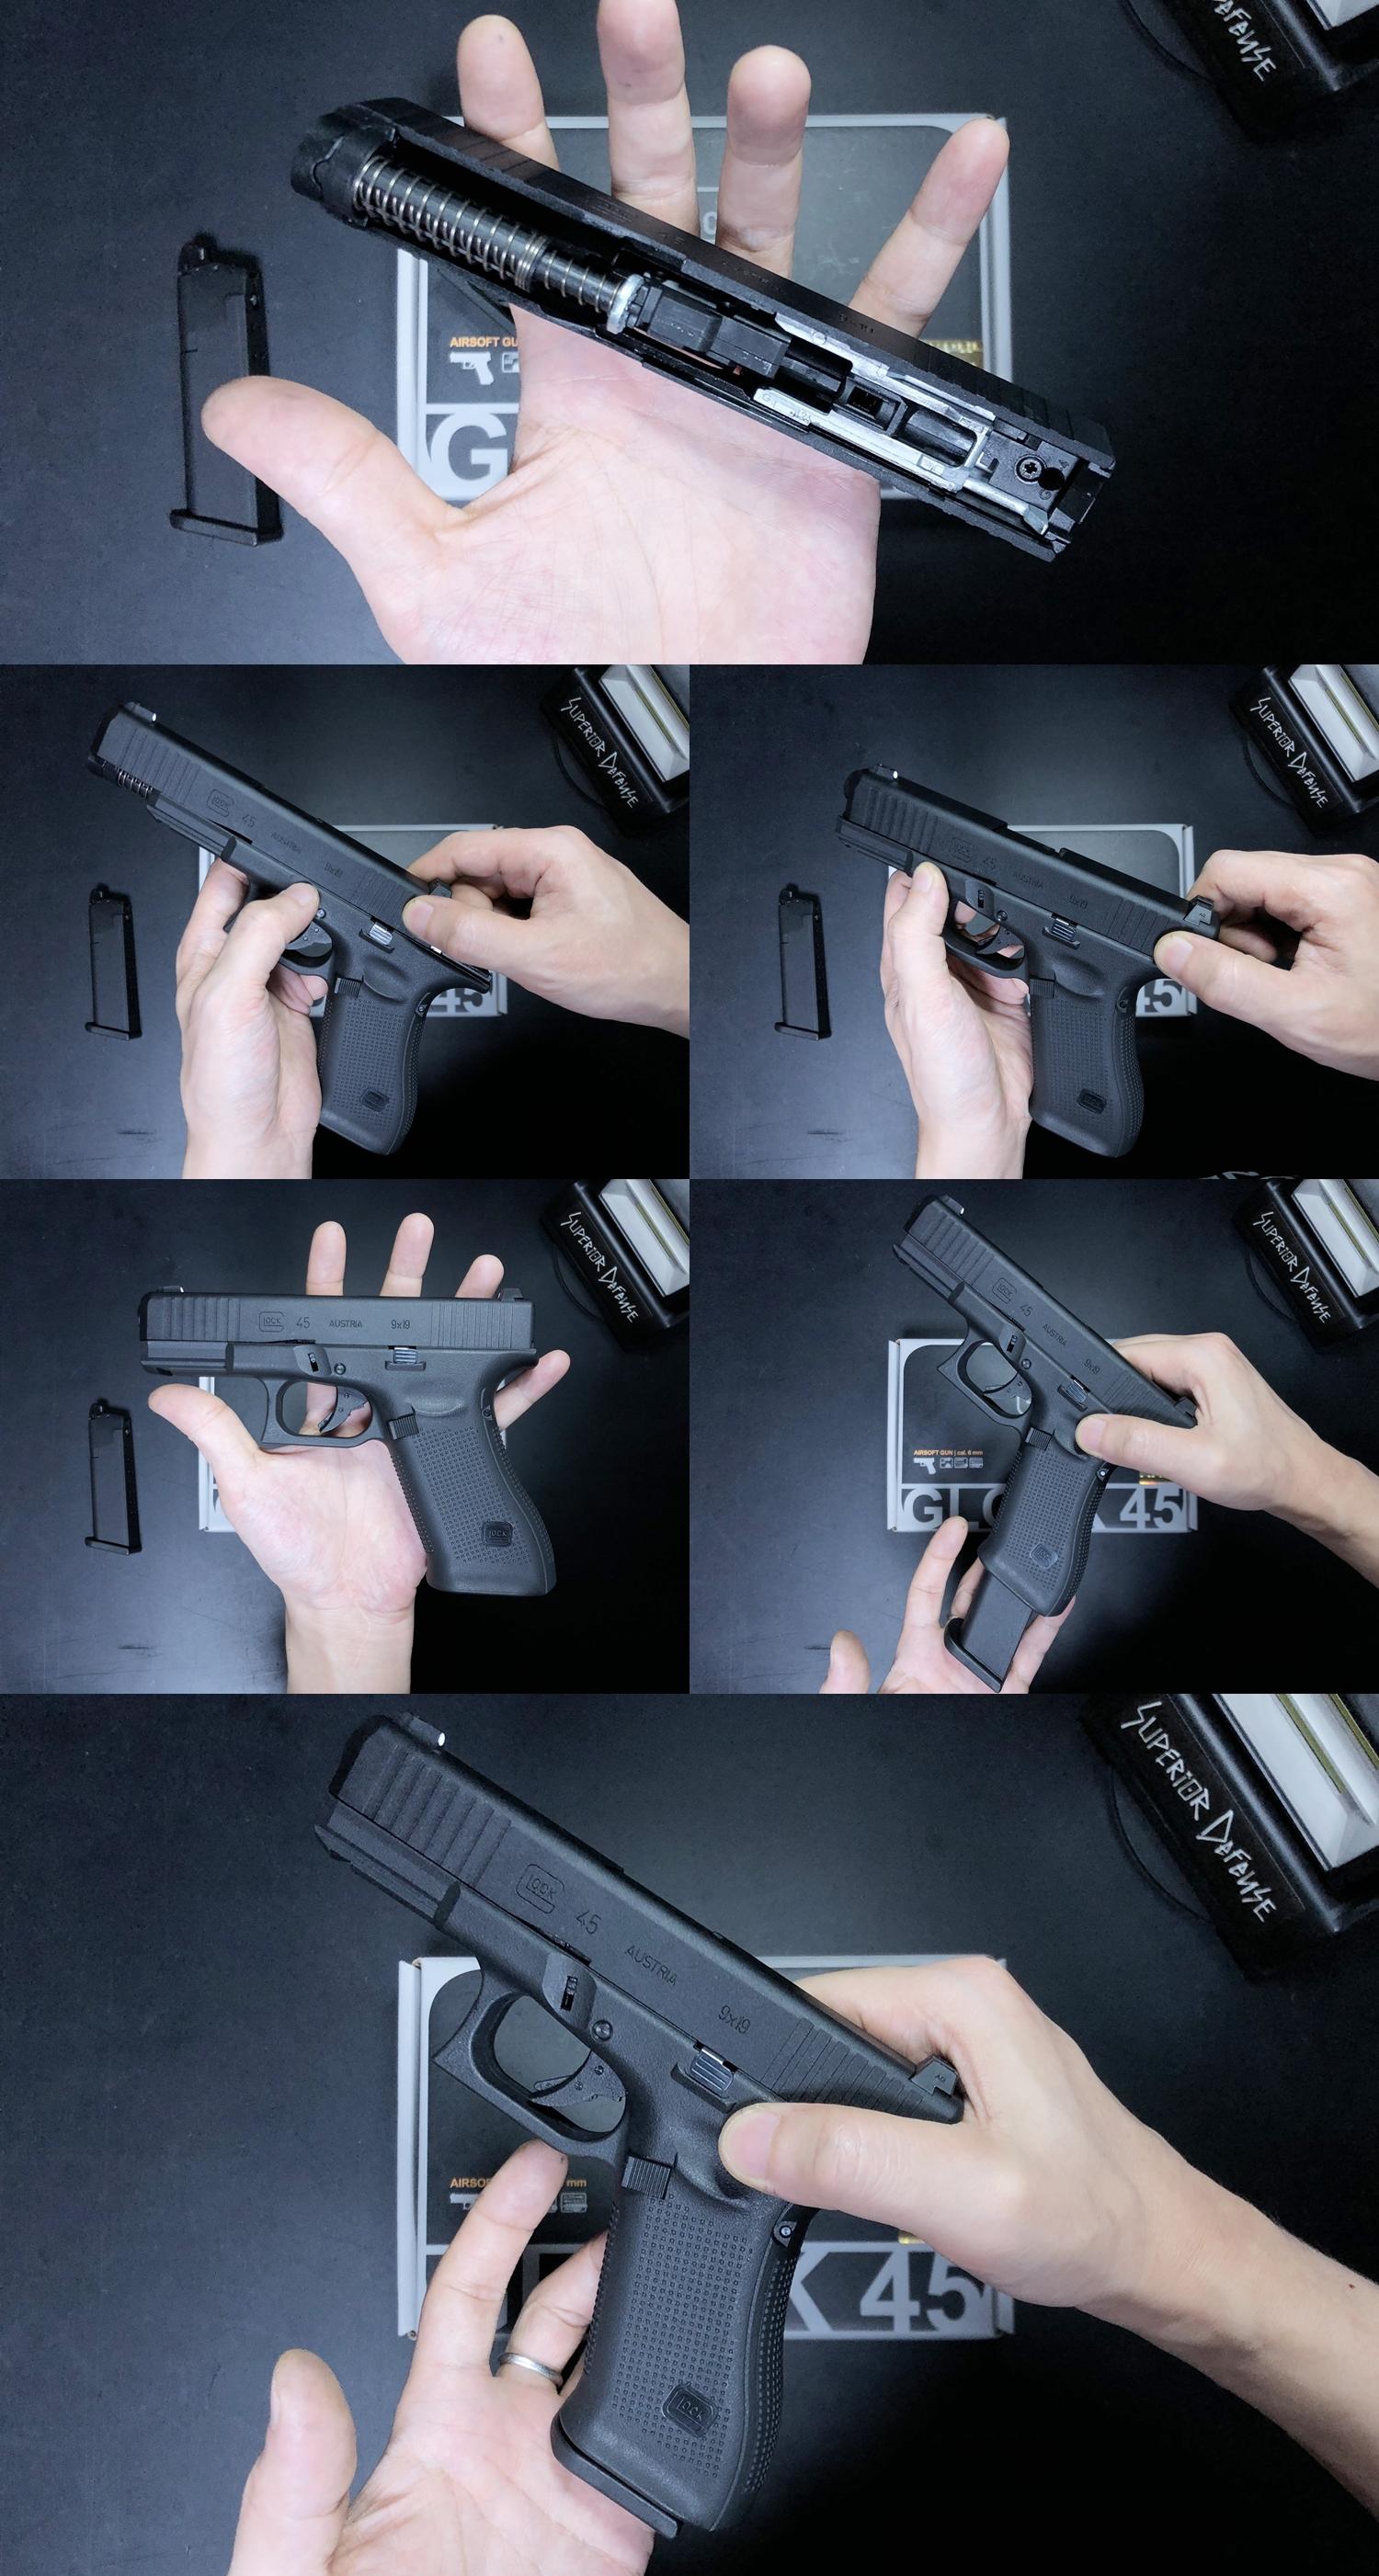 17 UMAREX VFC GLOCK G45 GBB AIRSOFT!! 噂のウマレックス G45 グロック ガスブローバック!! やっと我が家へ着弾 ~ 新品箱出し編!! 購入 開封 初速 計測 検証 比較 通常分解 組立 カスタム レビュー!!